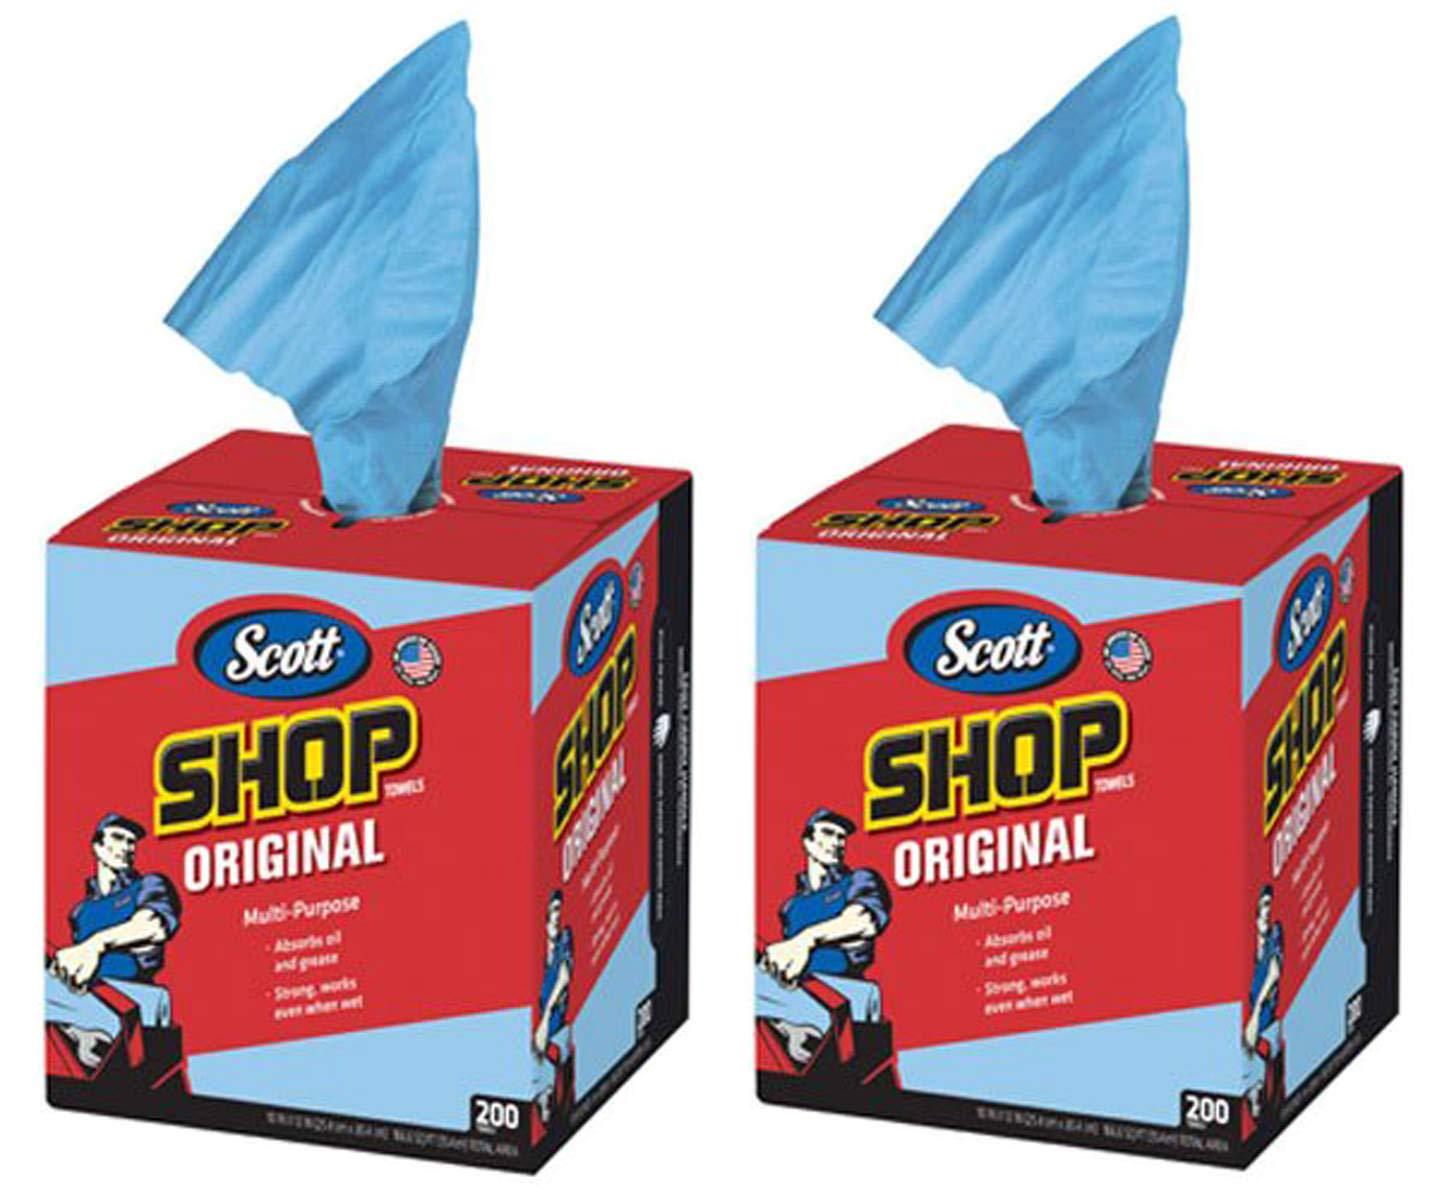 Scott USDEMTCB Kimberly-Clark 75190 Shop Towels, 10'' x 12'', Blue, 2 Box of 200 Towels